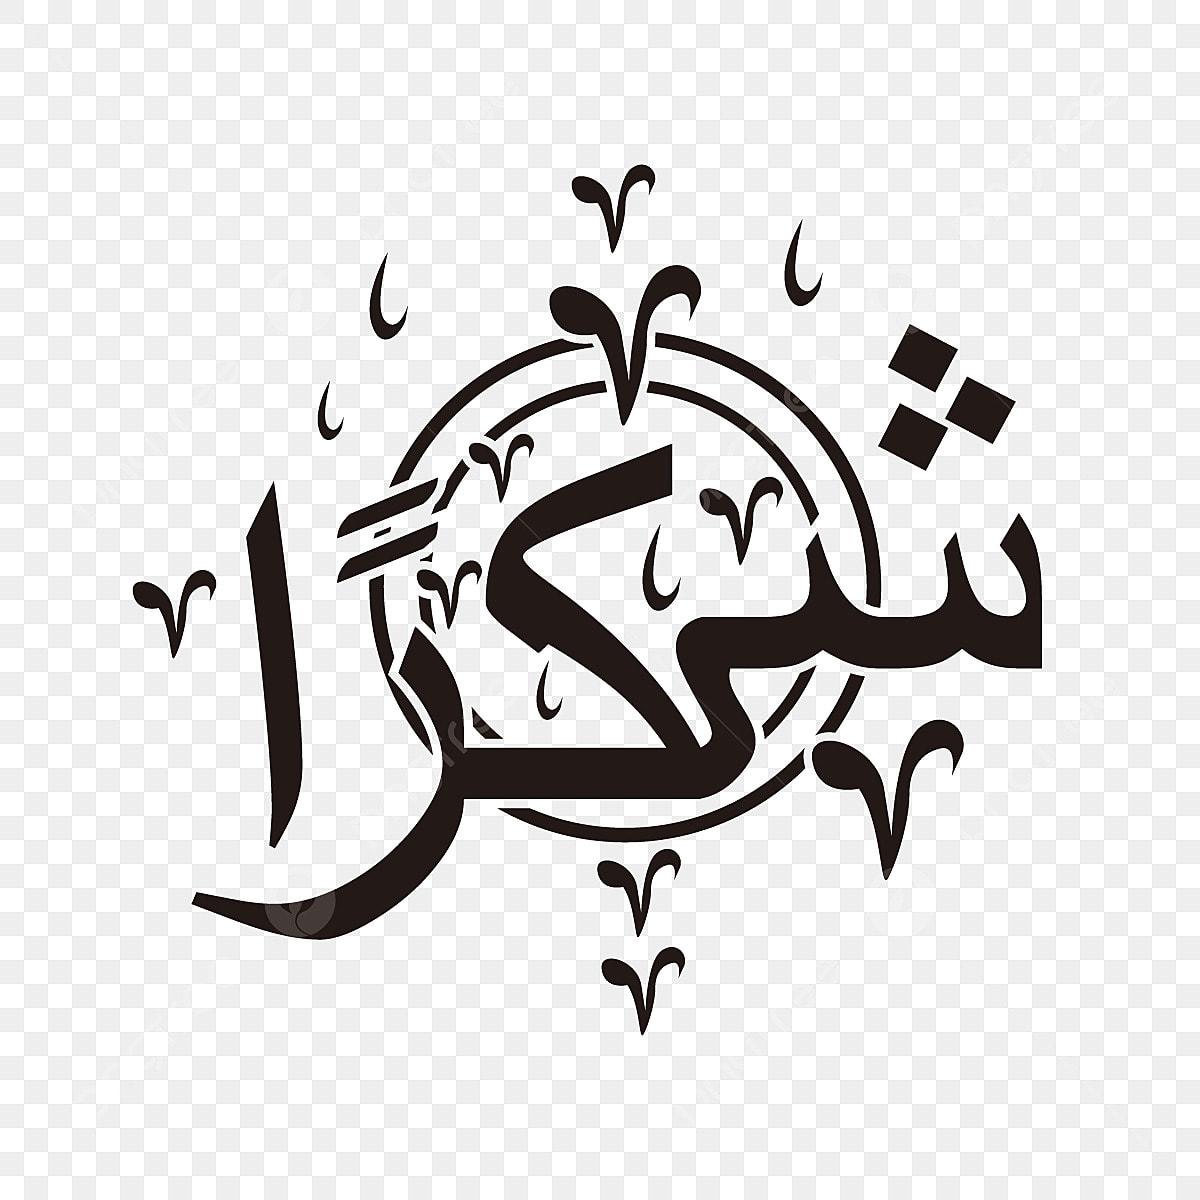 Kata Kata Bahasa Arab Kaligrafi Arab Kaligrafi Vektor Png